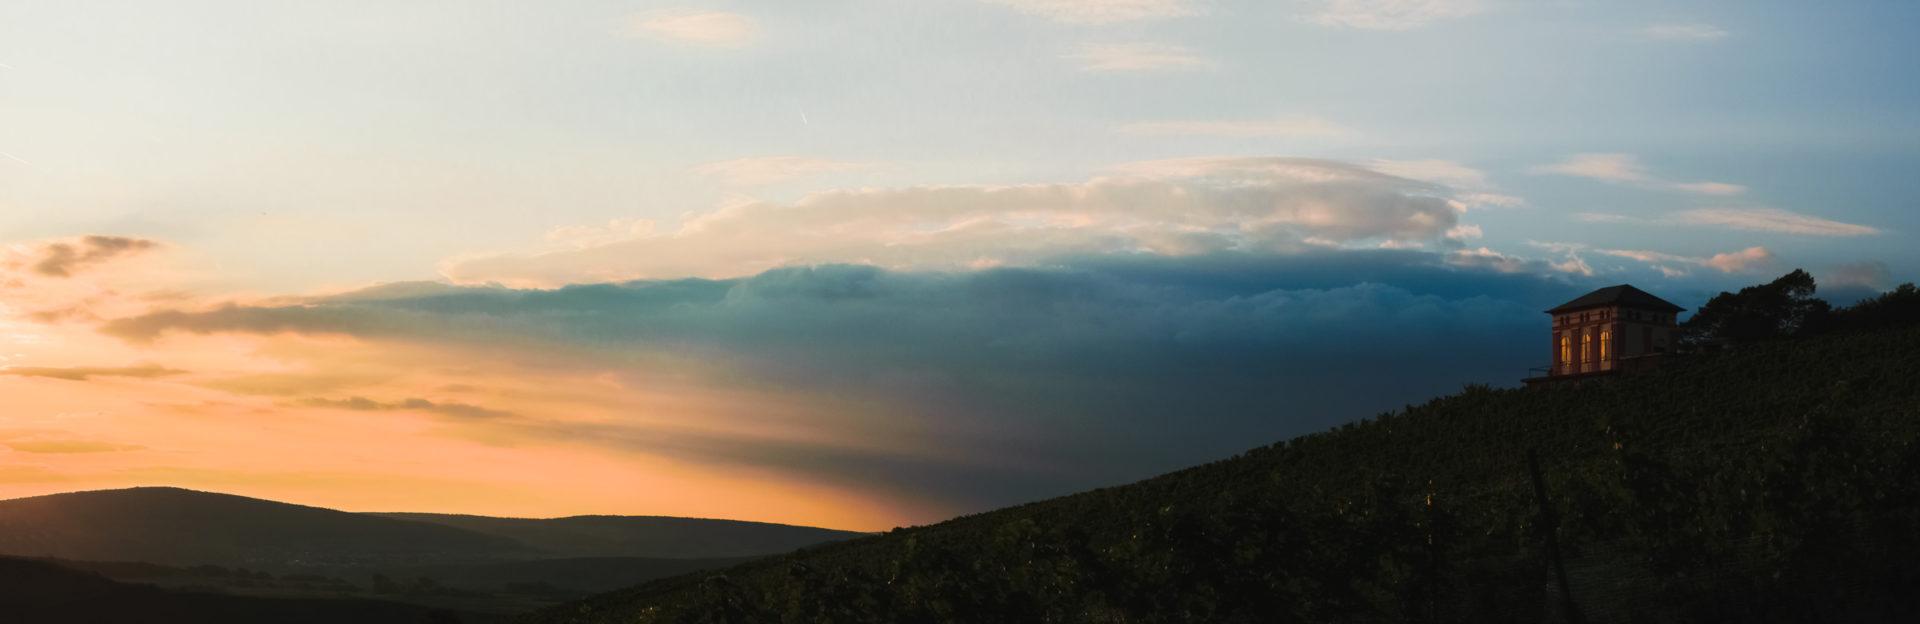 Ein wunderbarer Sonnenuntergang am Elisenberg